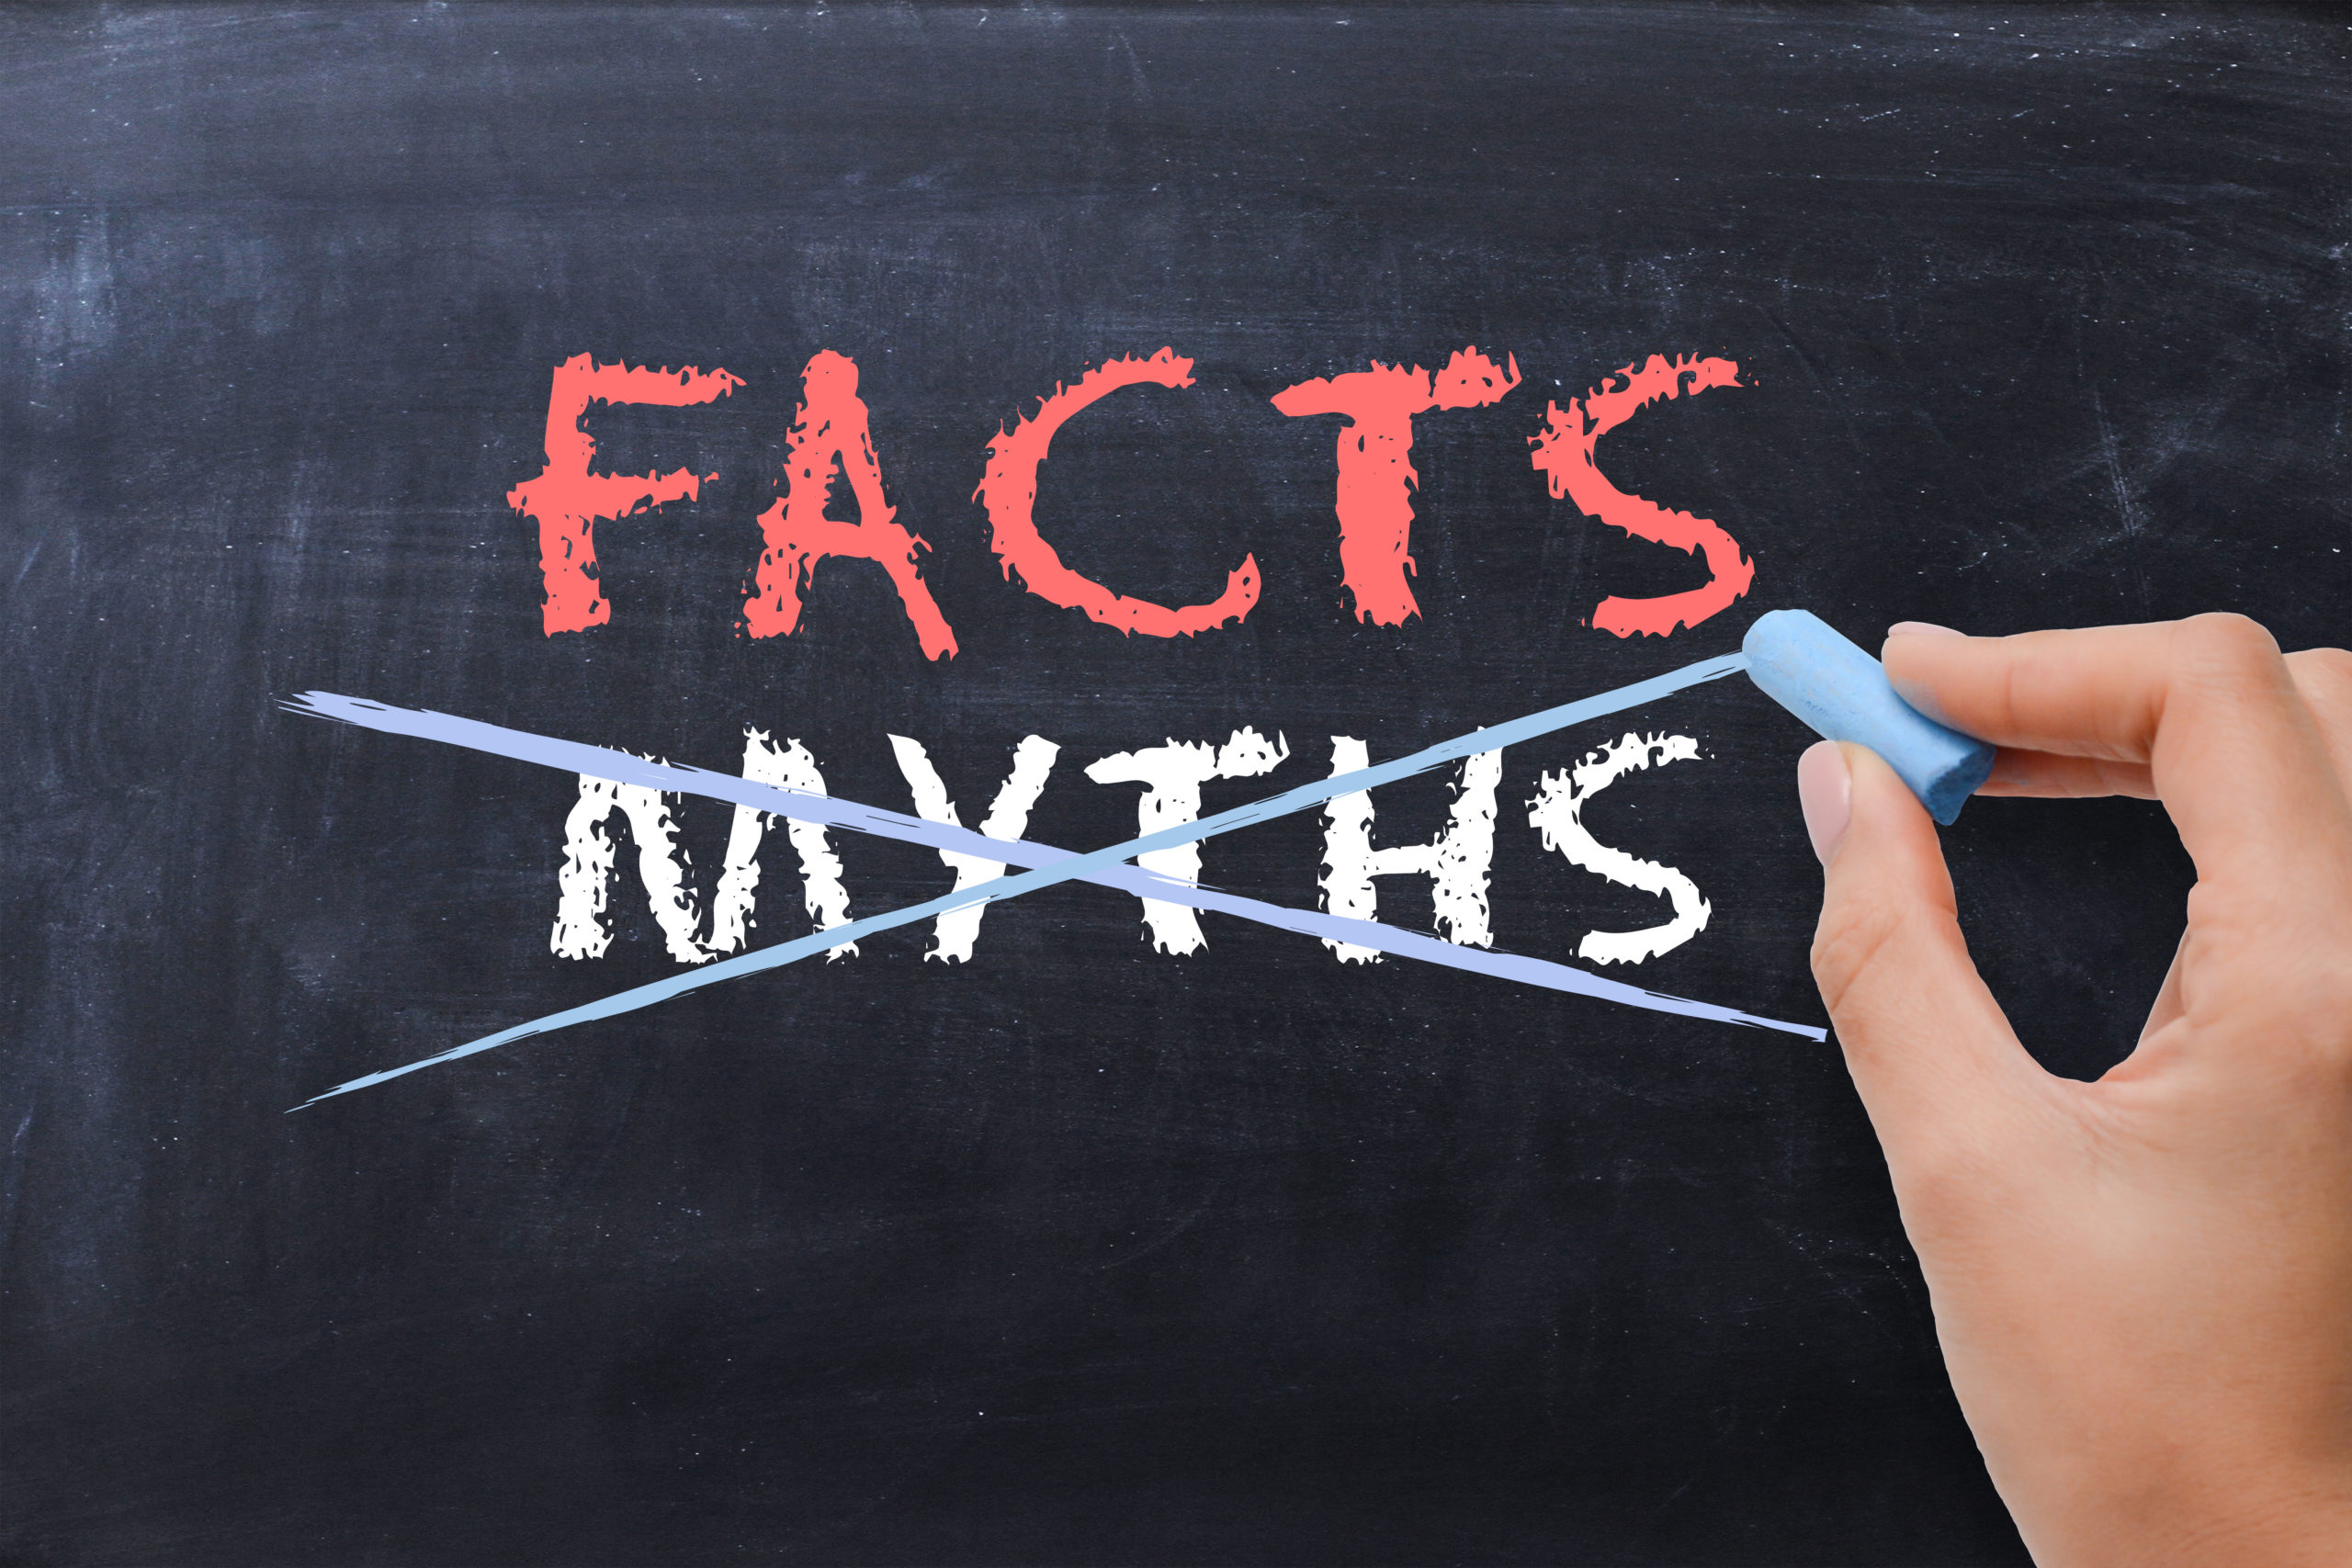 Professional Indemnity Myths